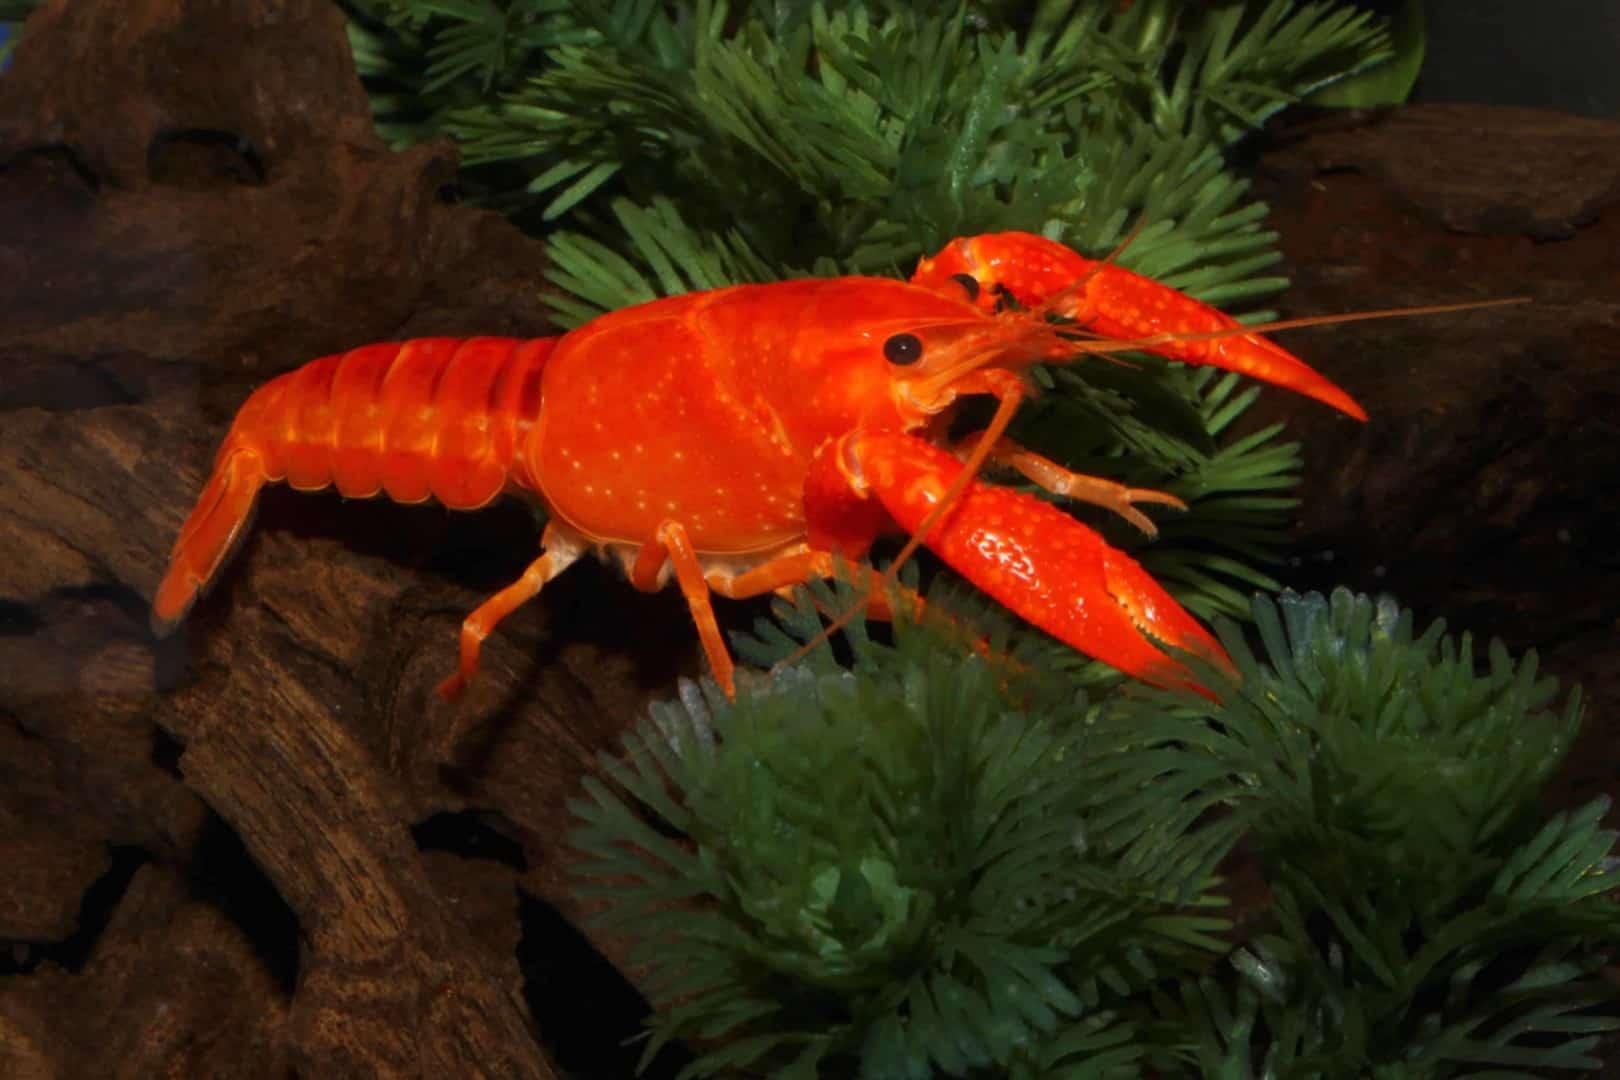 Procambarus clarkii - Orangefarbener amerikanischer Sumpfkrebs 2